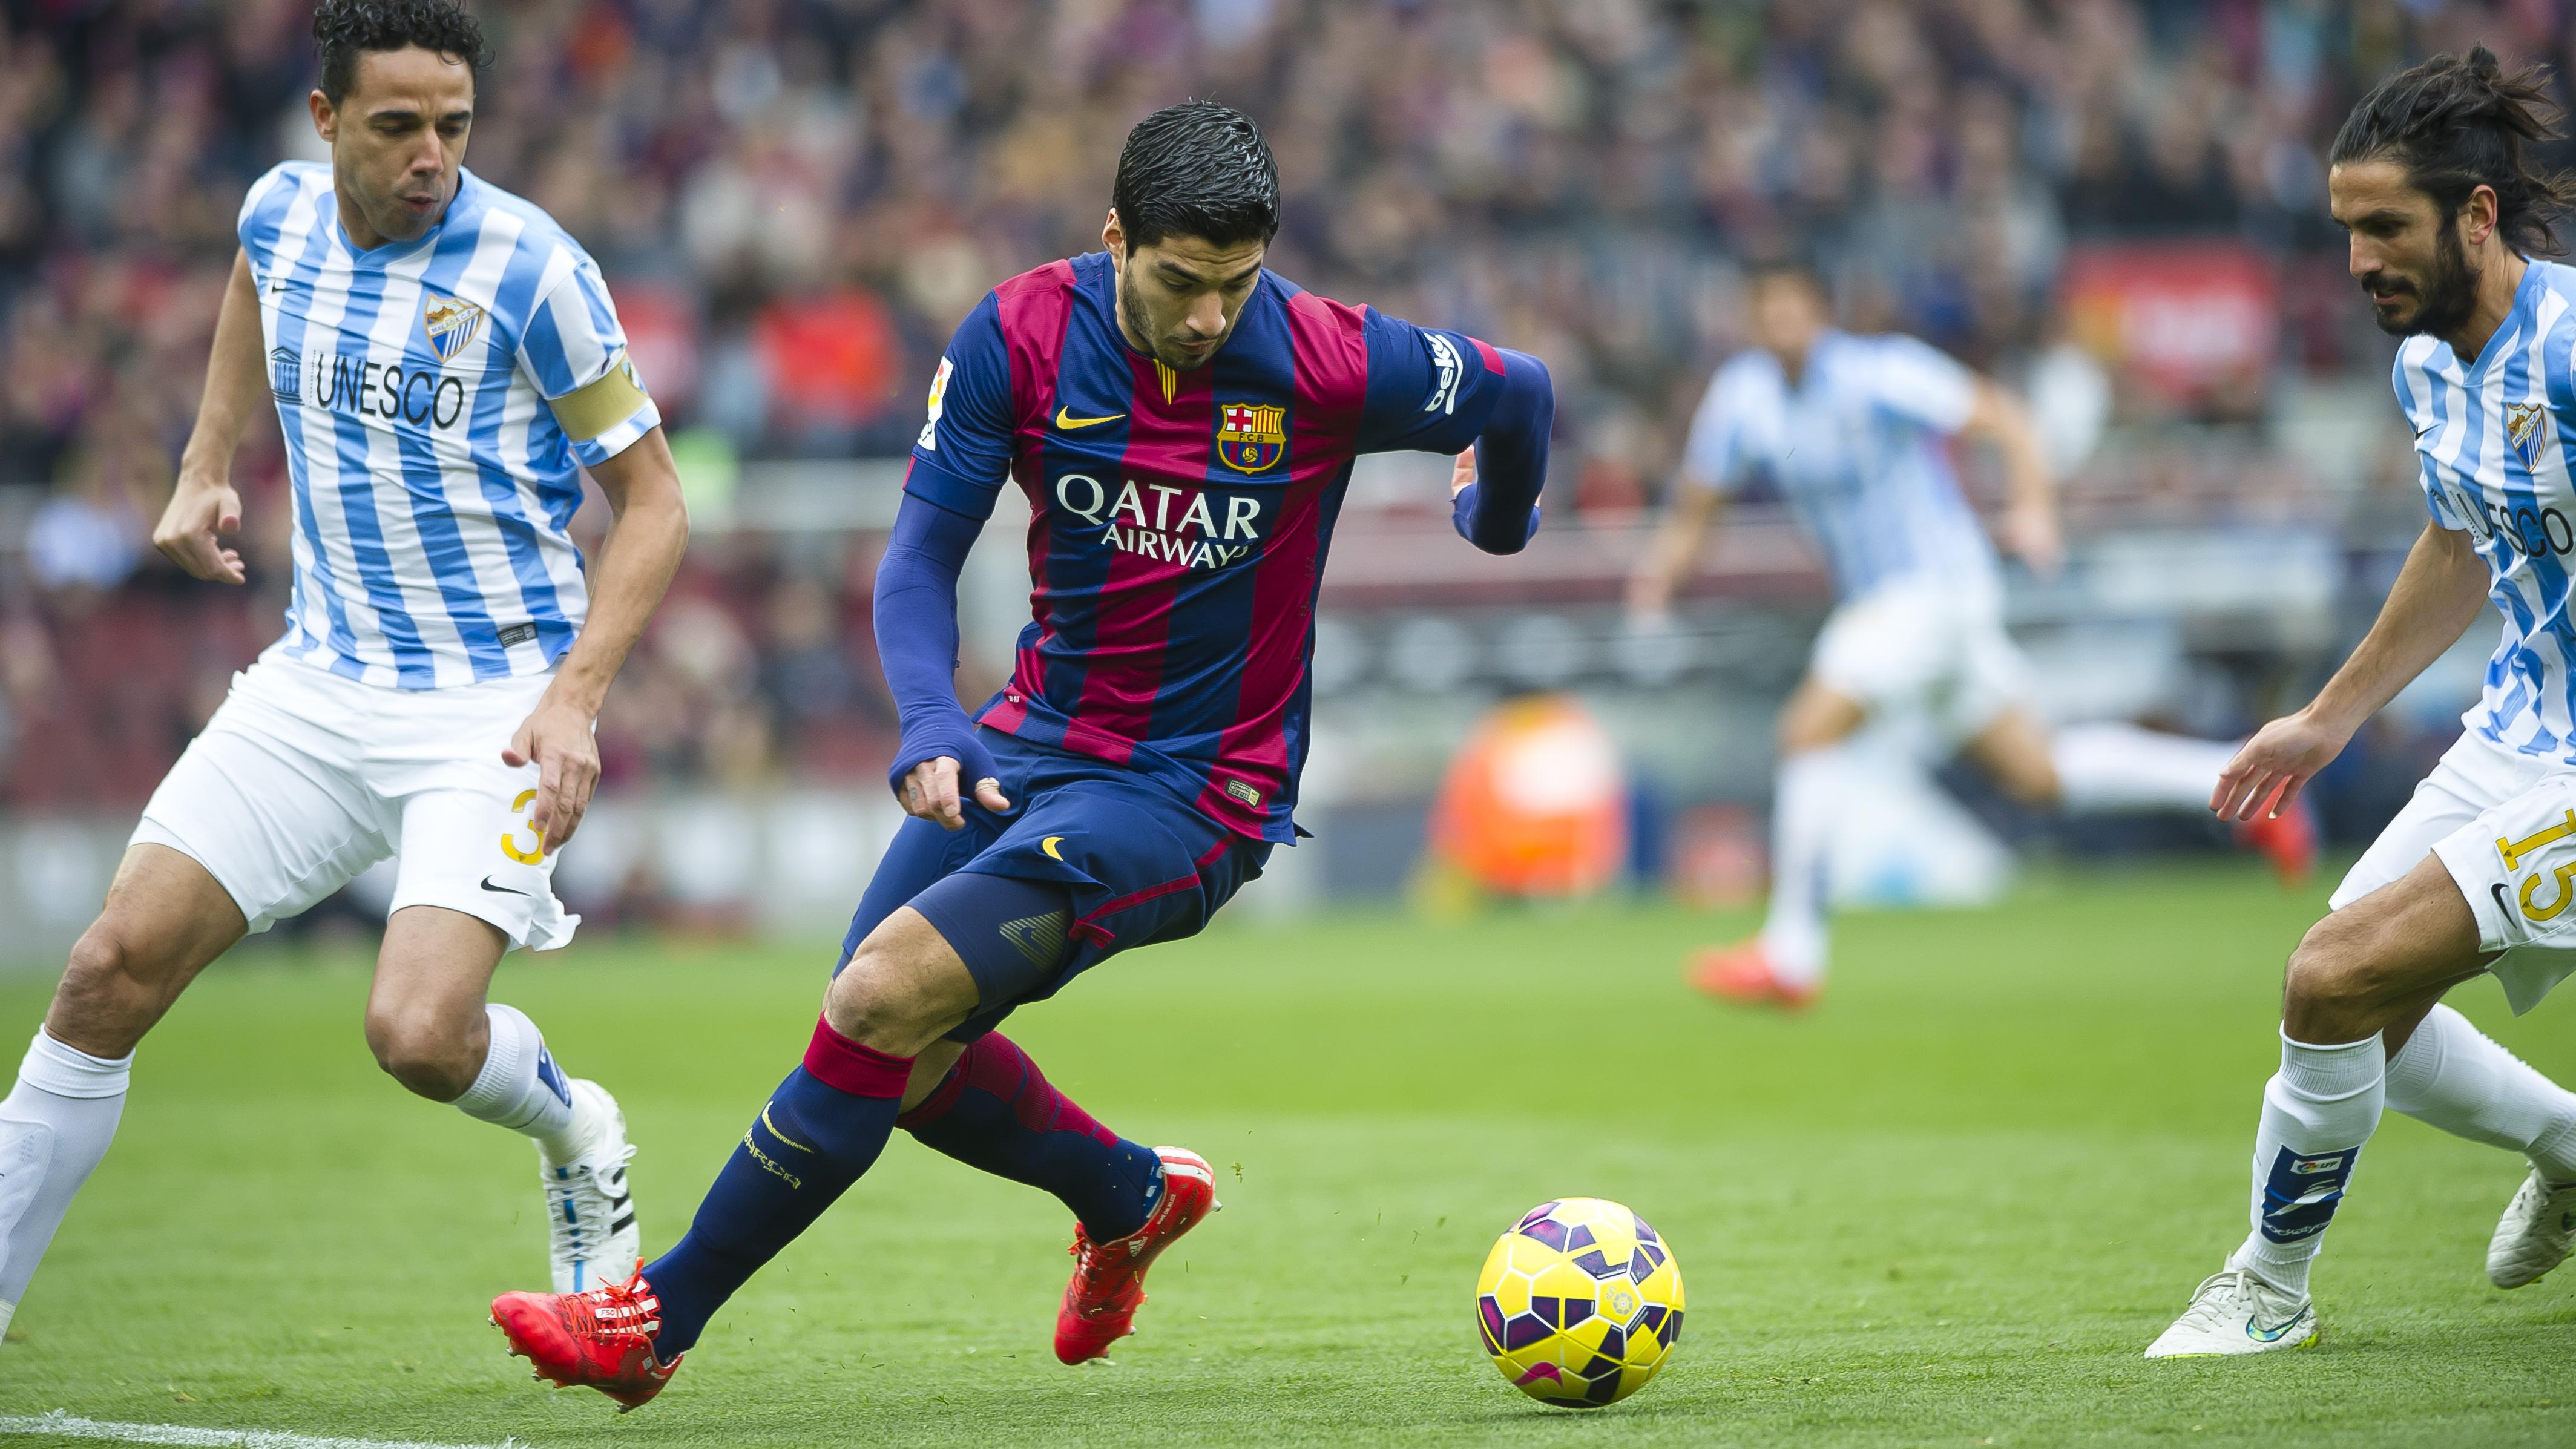 Sevilla vs malaga betting preview nfl largest uk betting companies